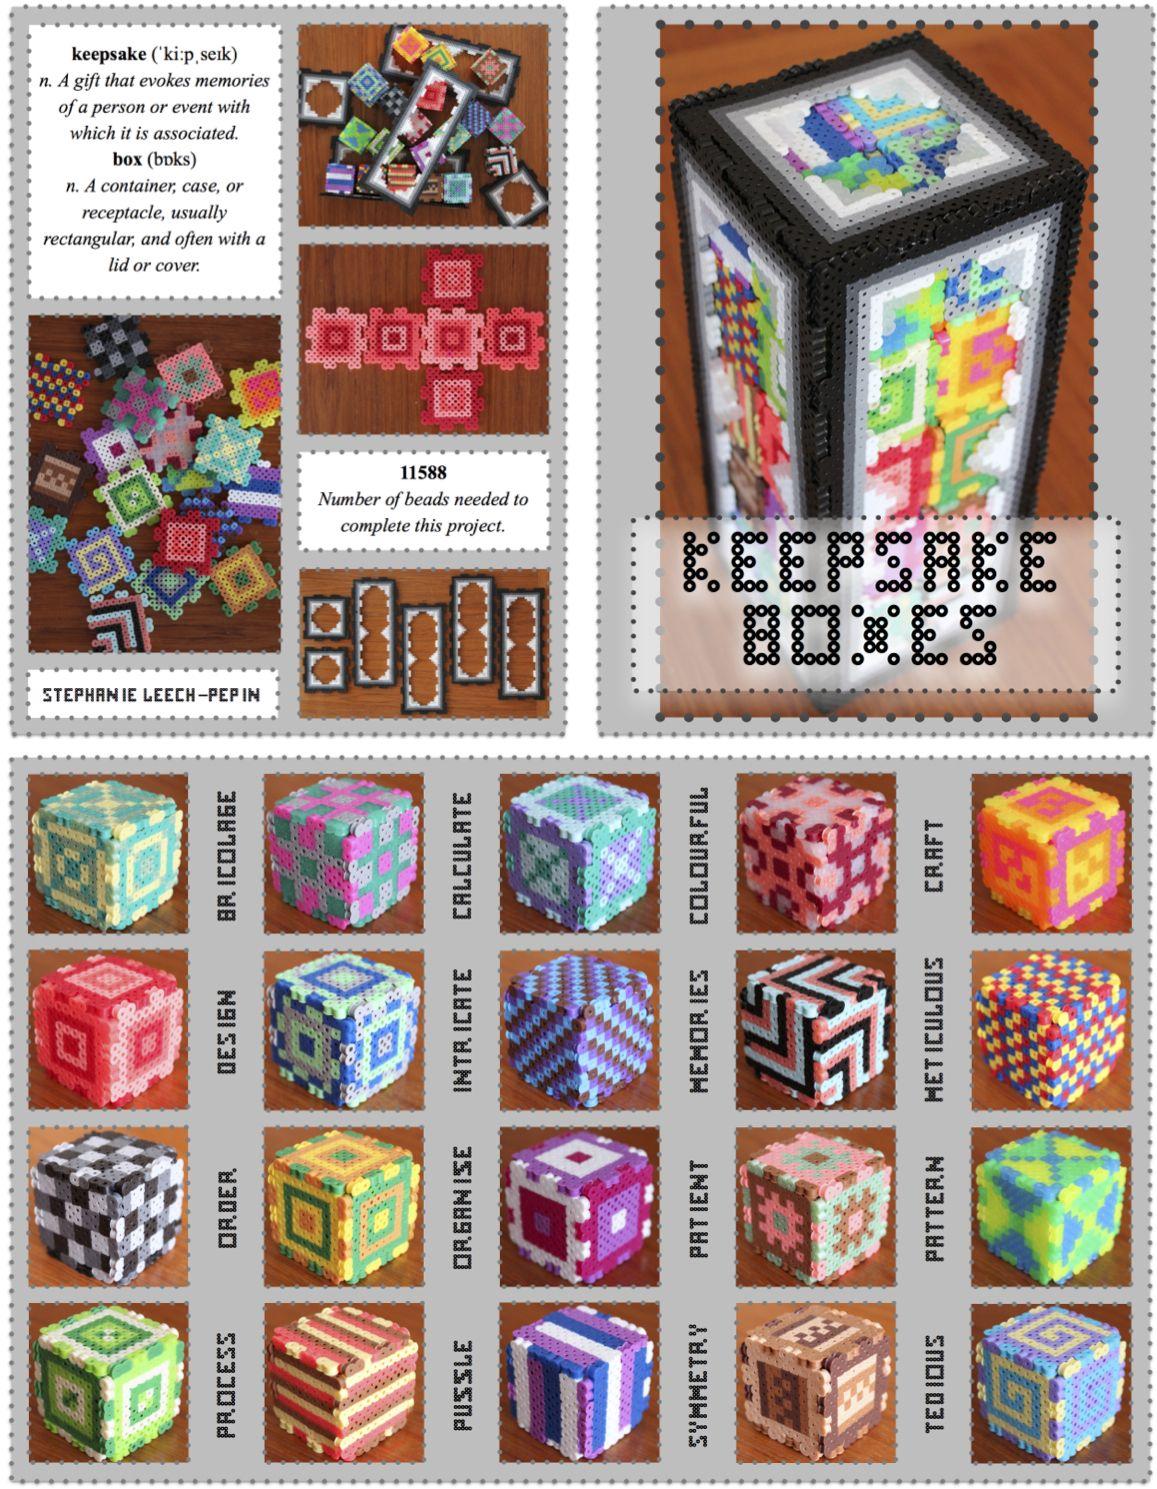 perler bead keepsake boxes  so much fun! by steph leech-pepin